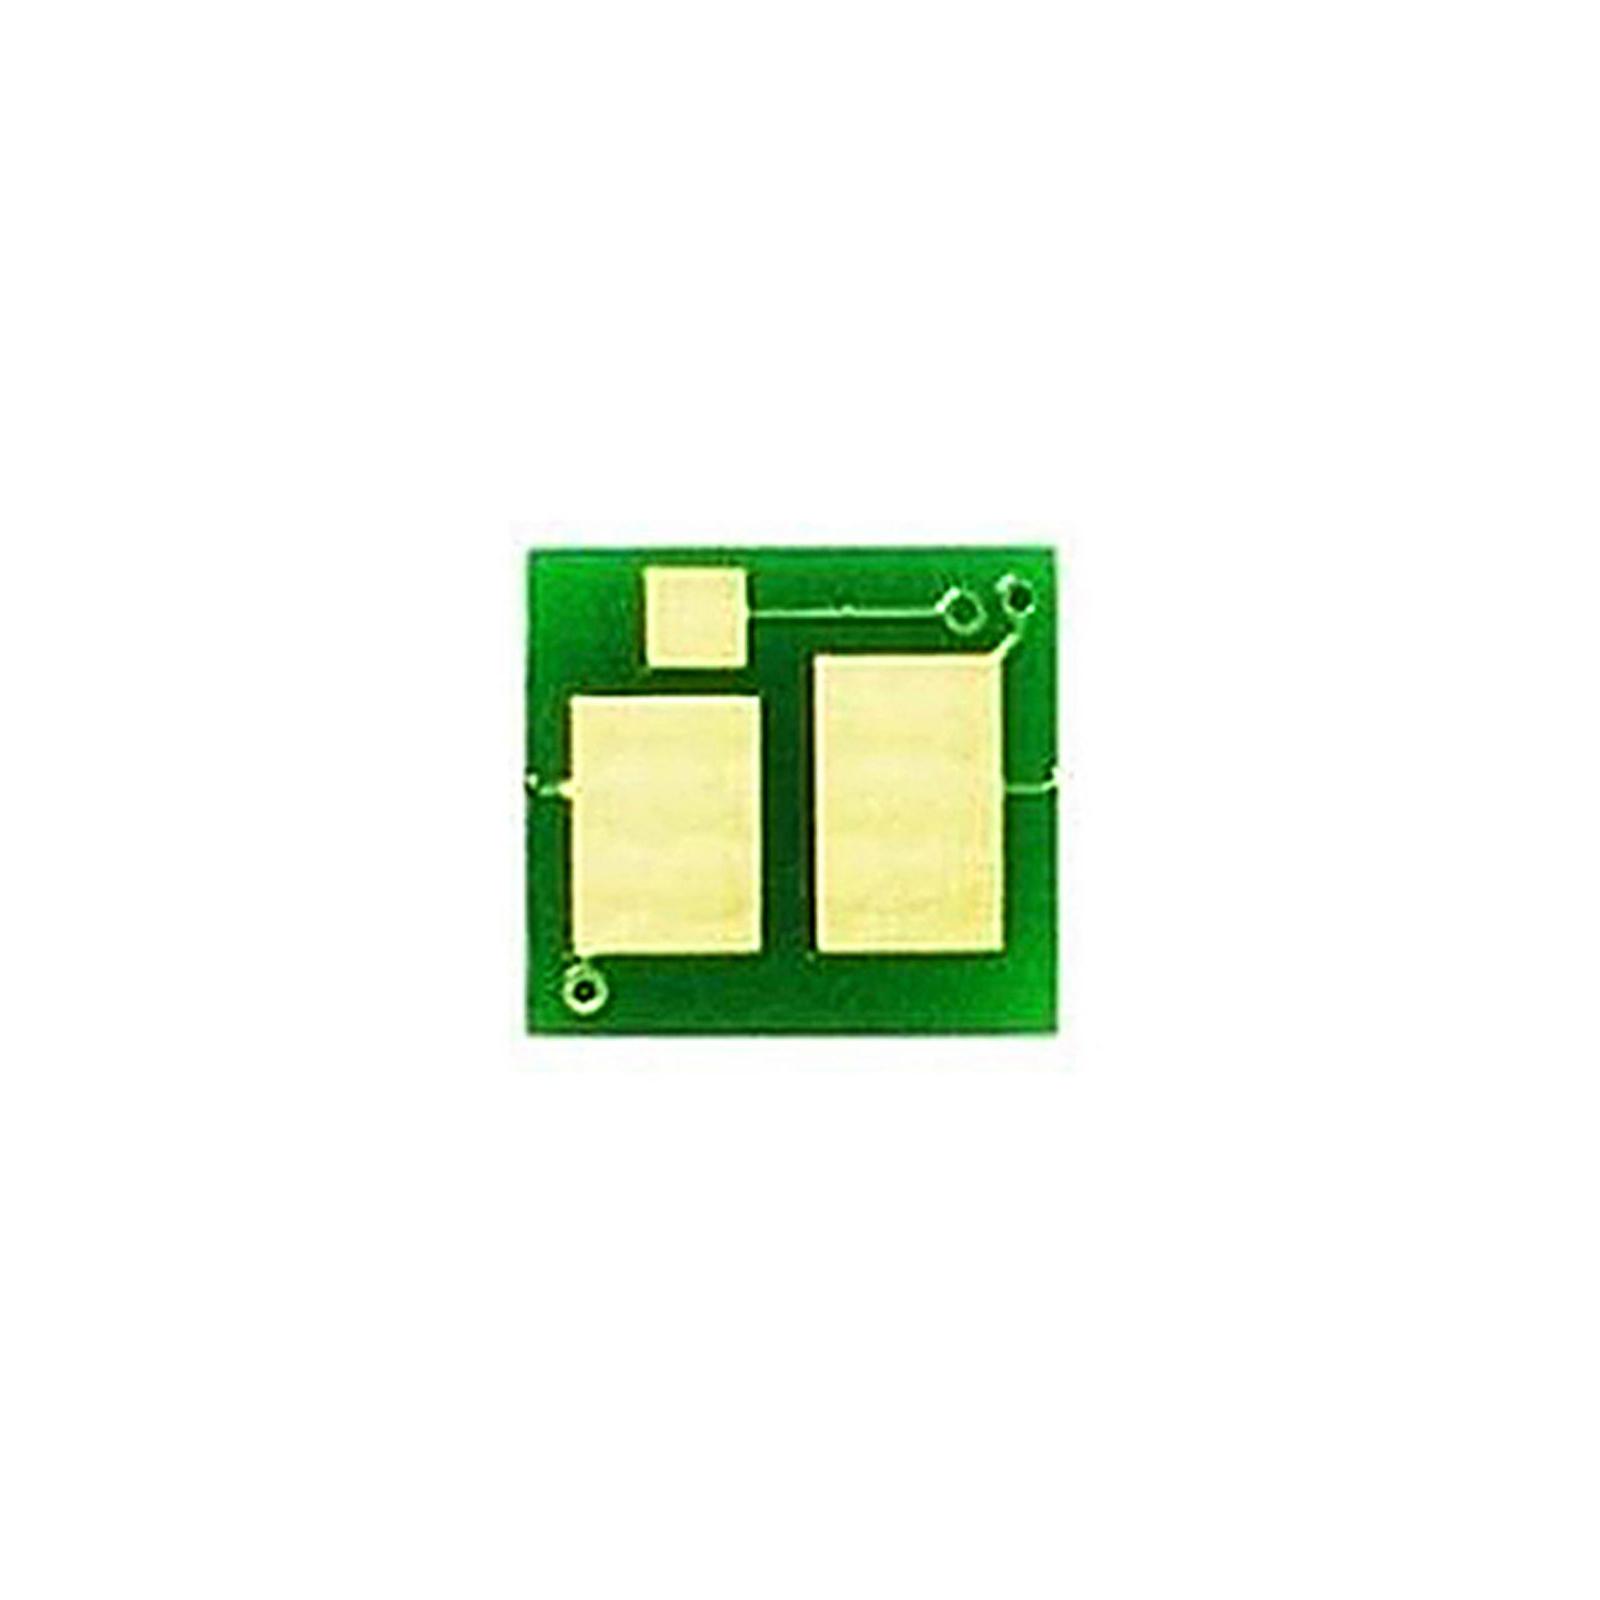 Чип для картриджа HP CLJ M254 2.5k cyan (CF541X) Static Control (HM254CP-HYCEU)